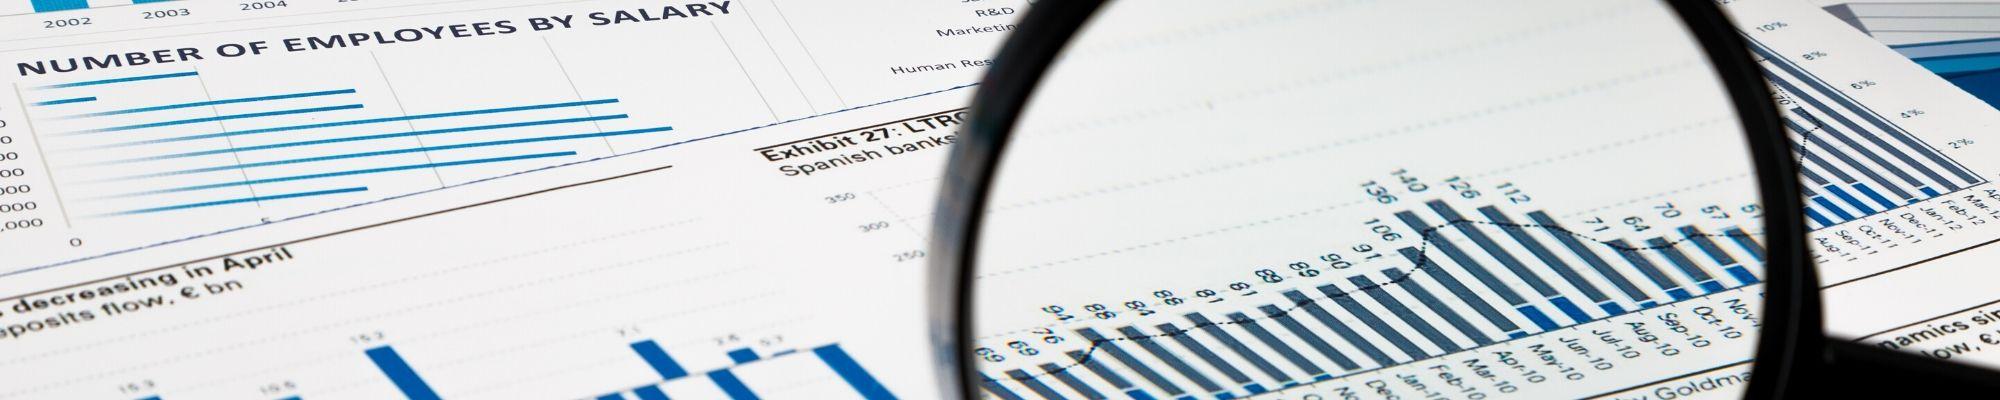 Business Relationship Management Compensation Report